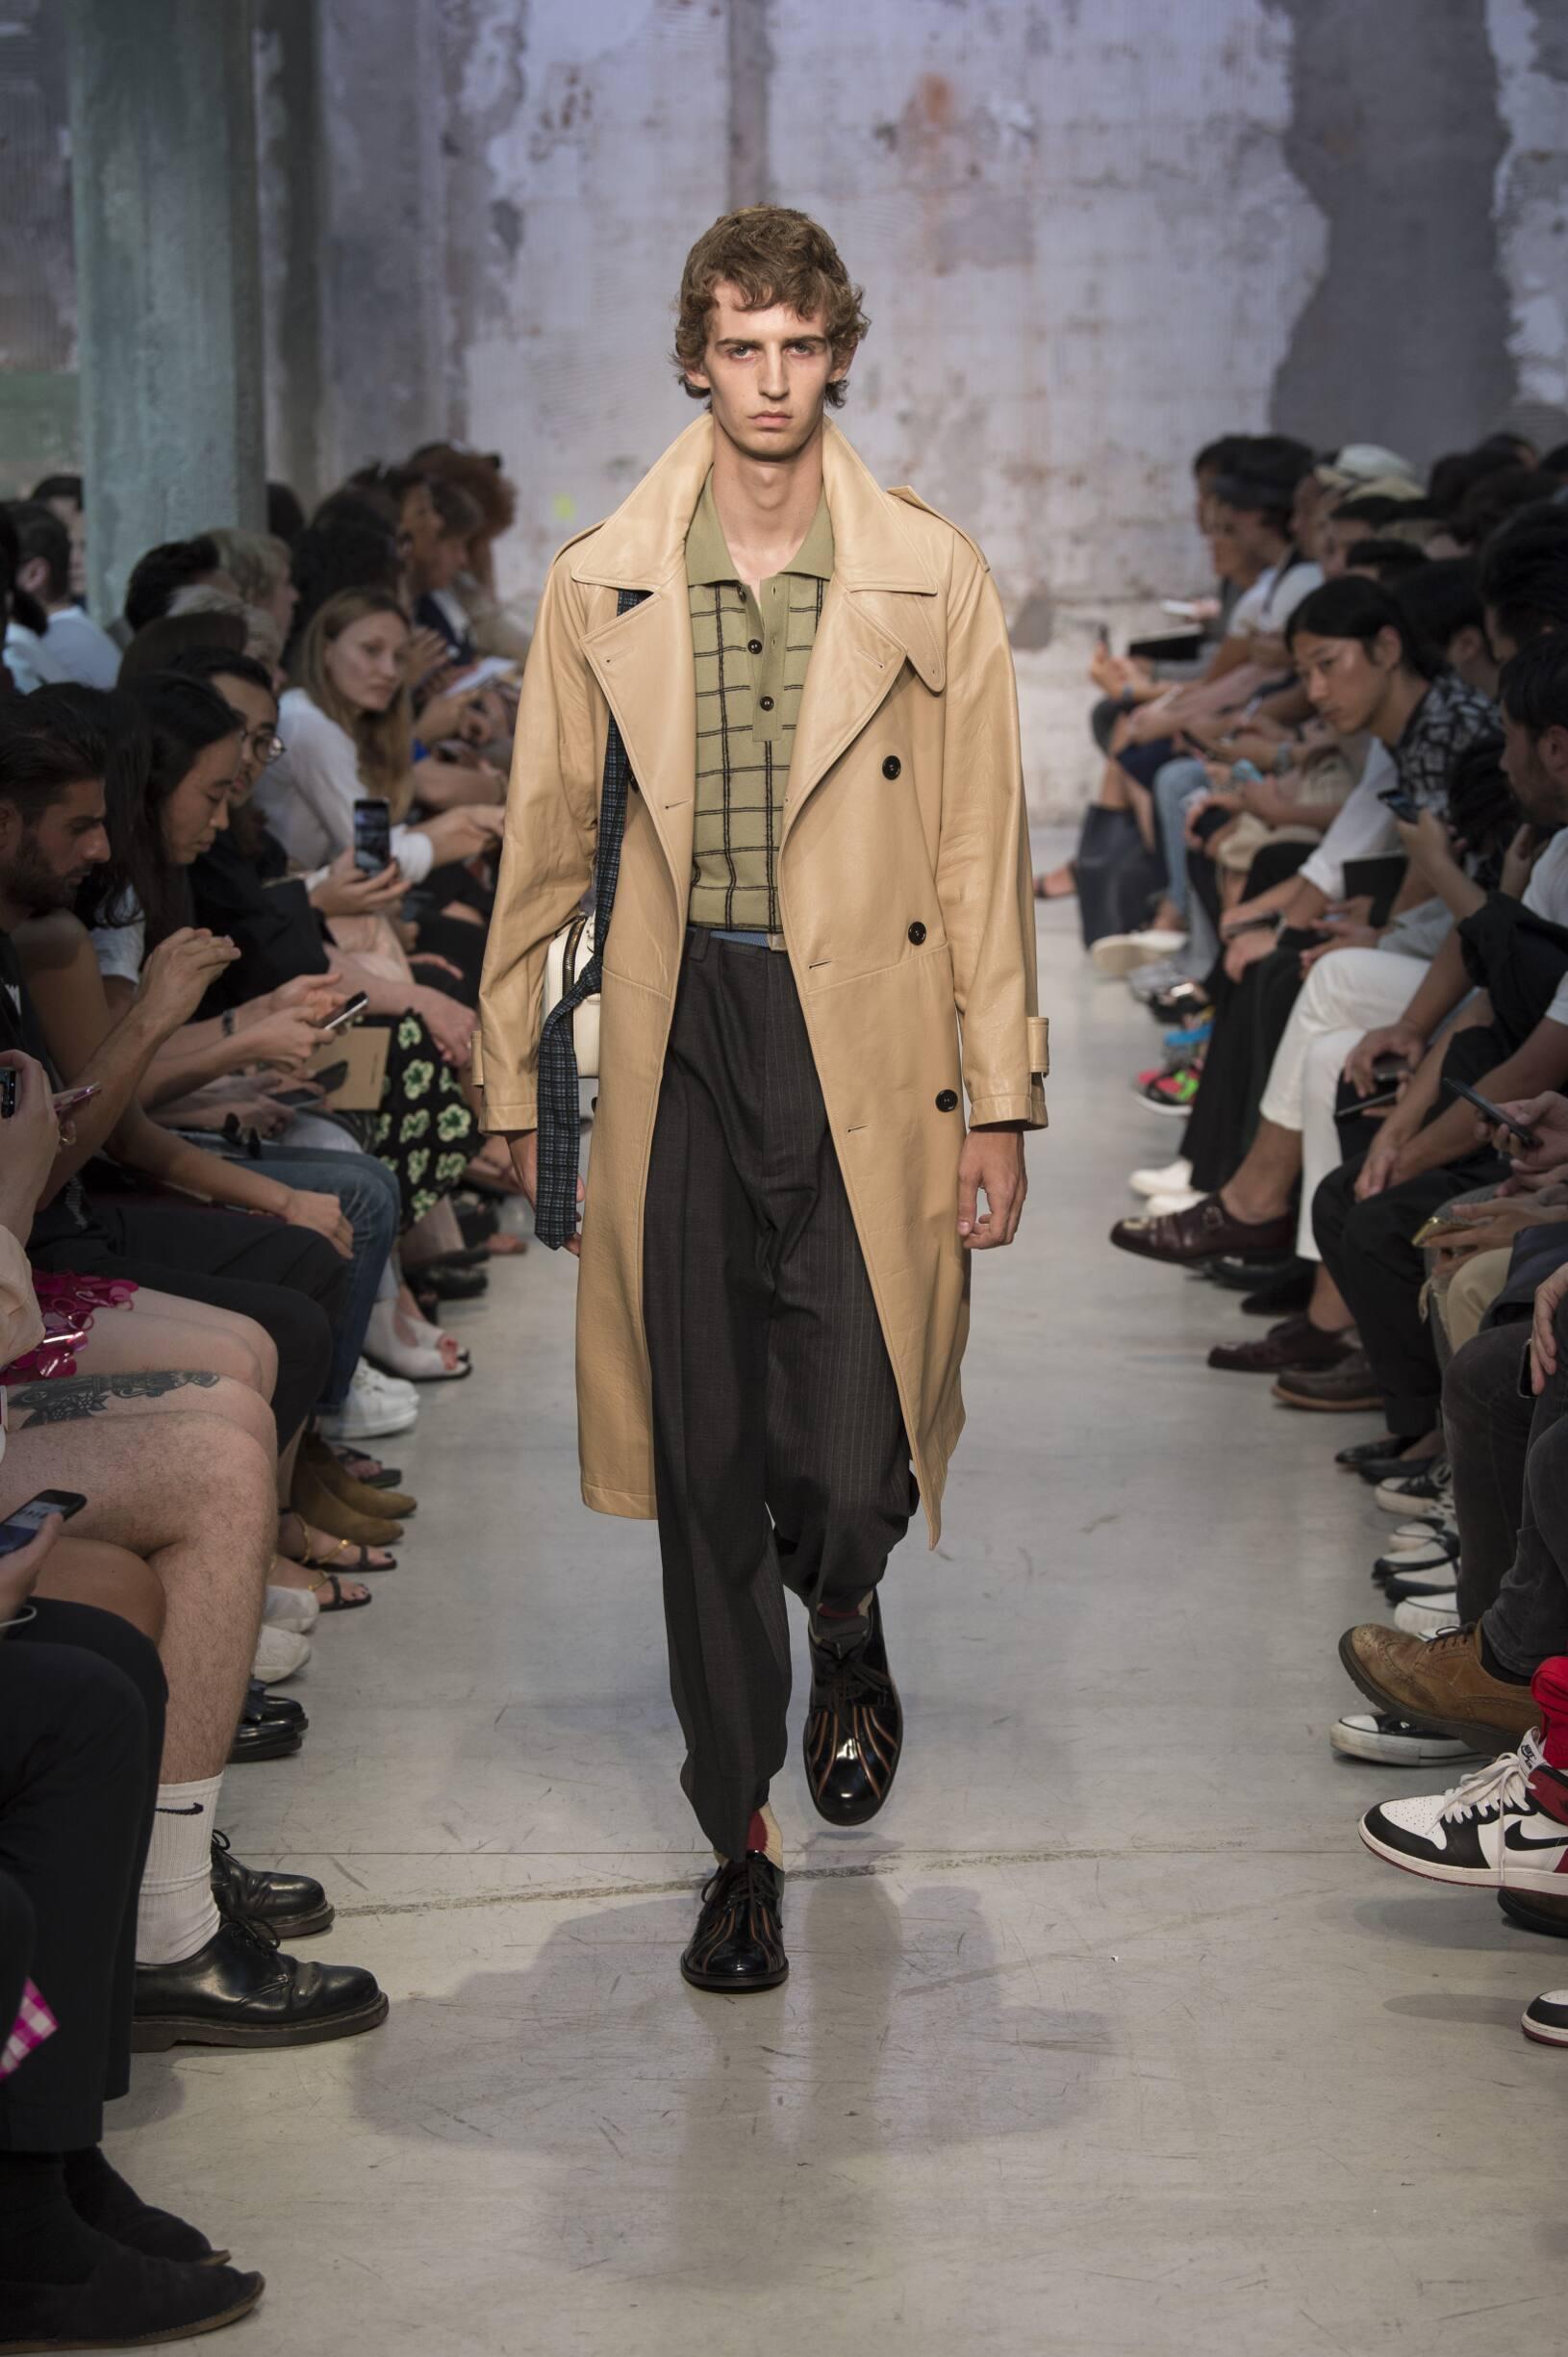 Fashion Man Model Marni Catwalk